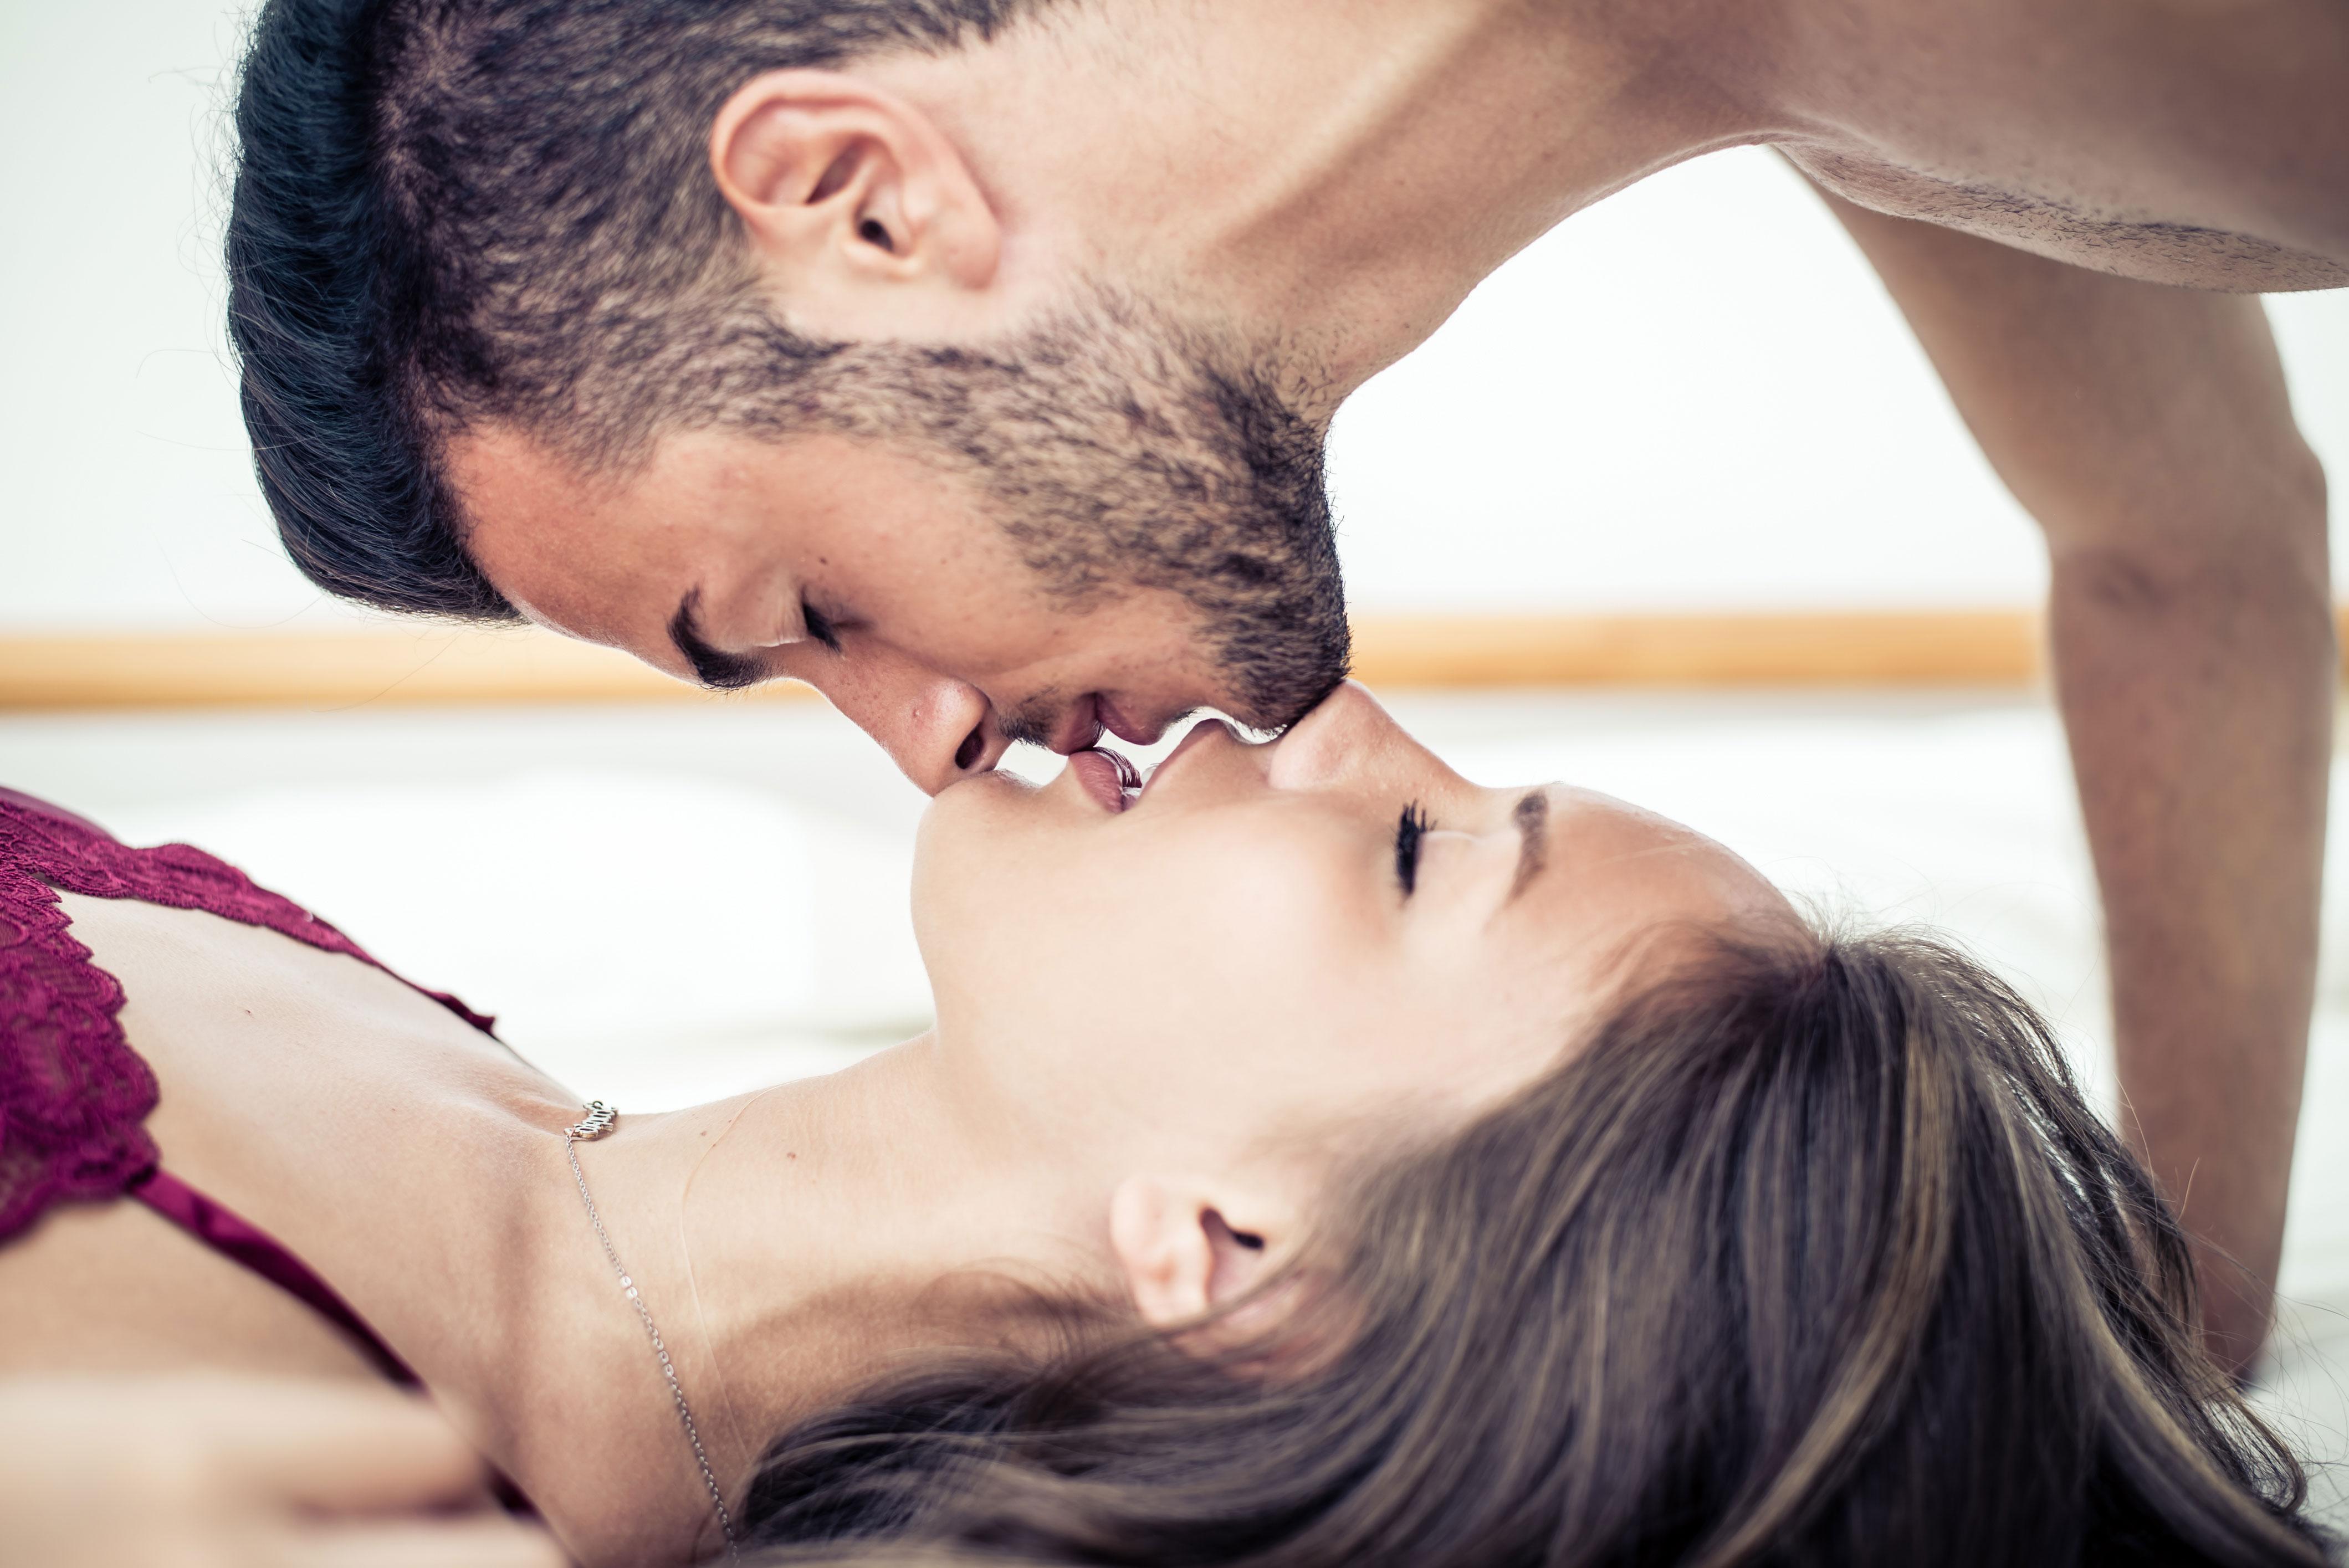 Beginner's Guide to Nipple Play